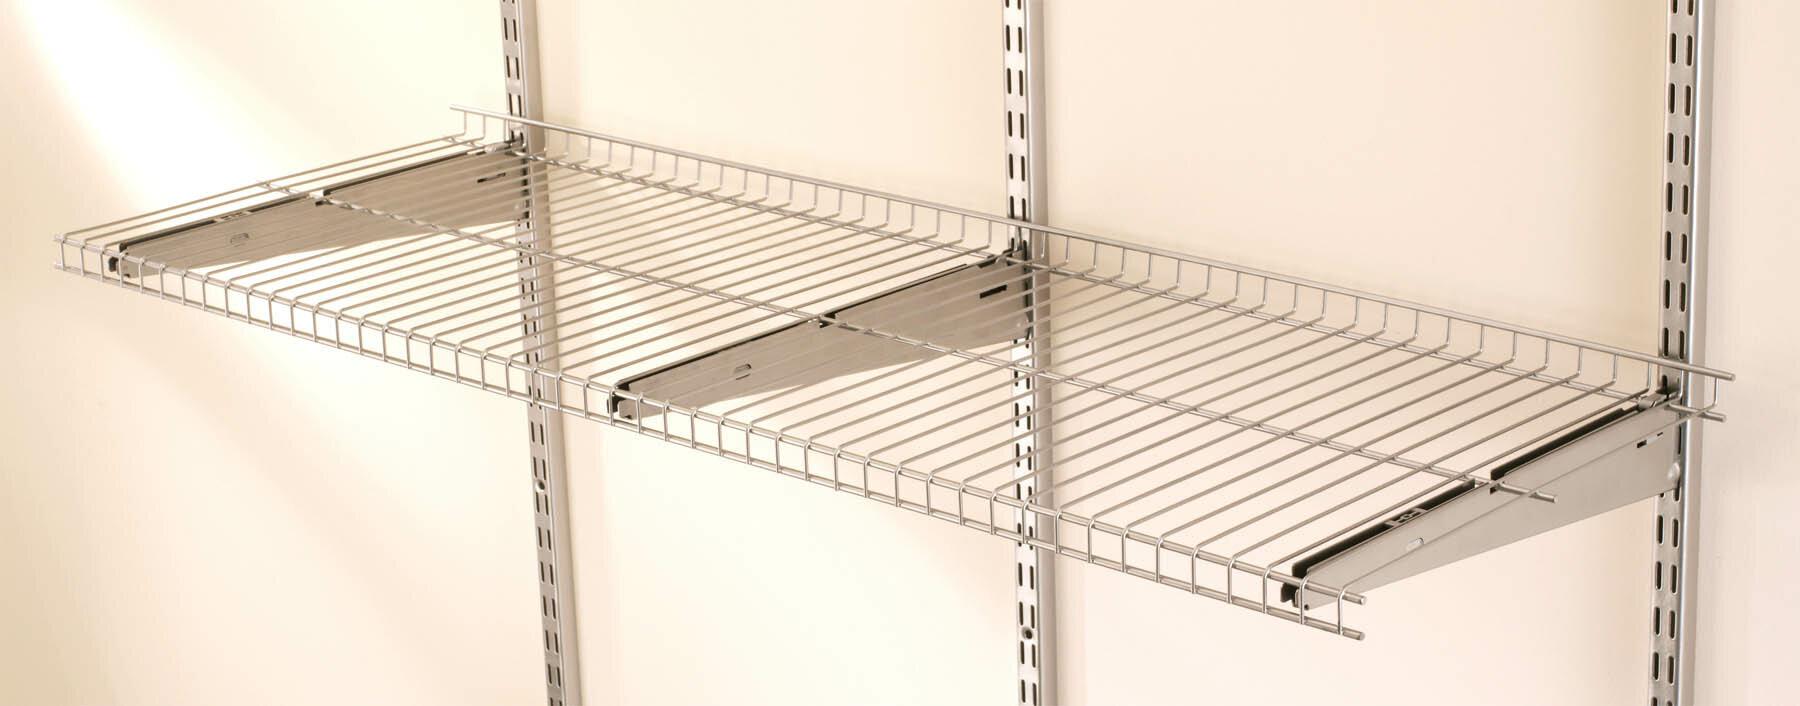 2c5d3e300a5 Rubbermaid FastTrack Wire Shelf   Reviews